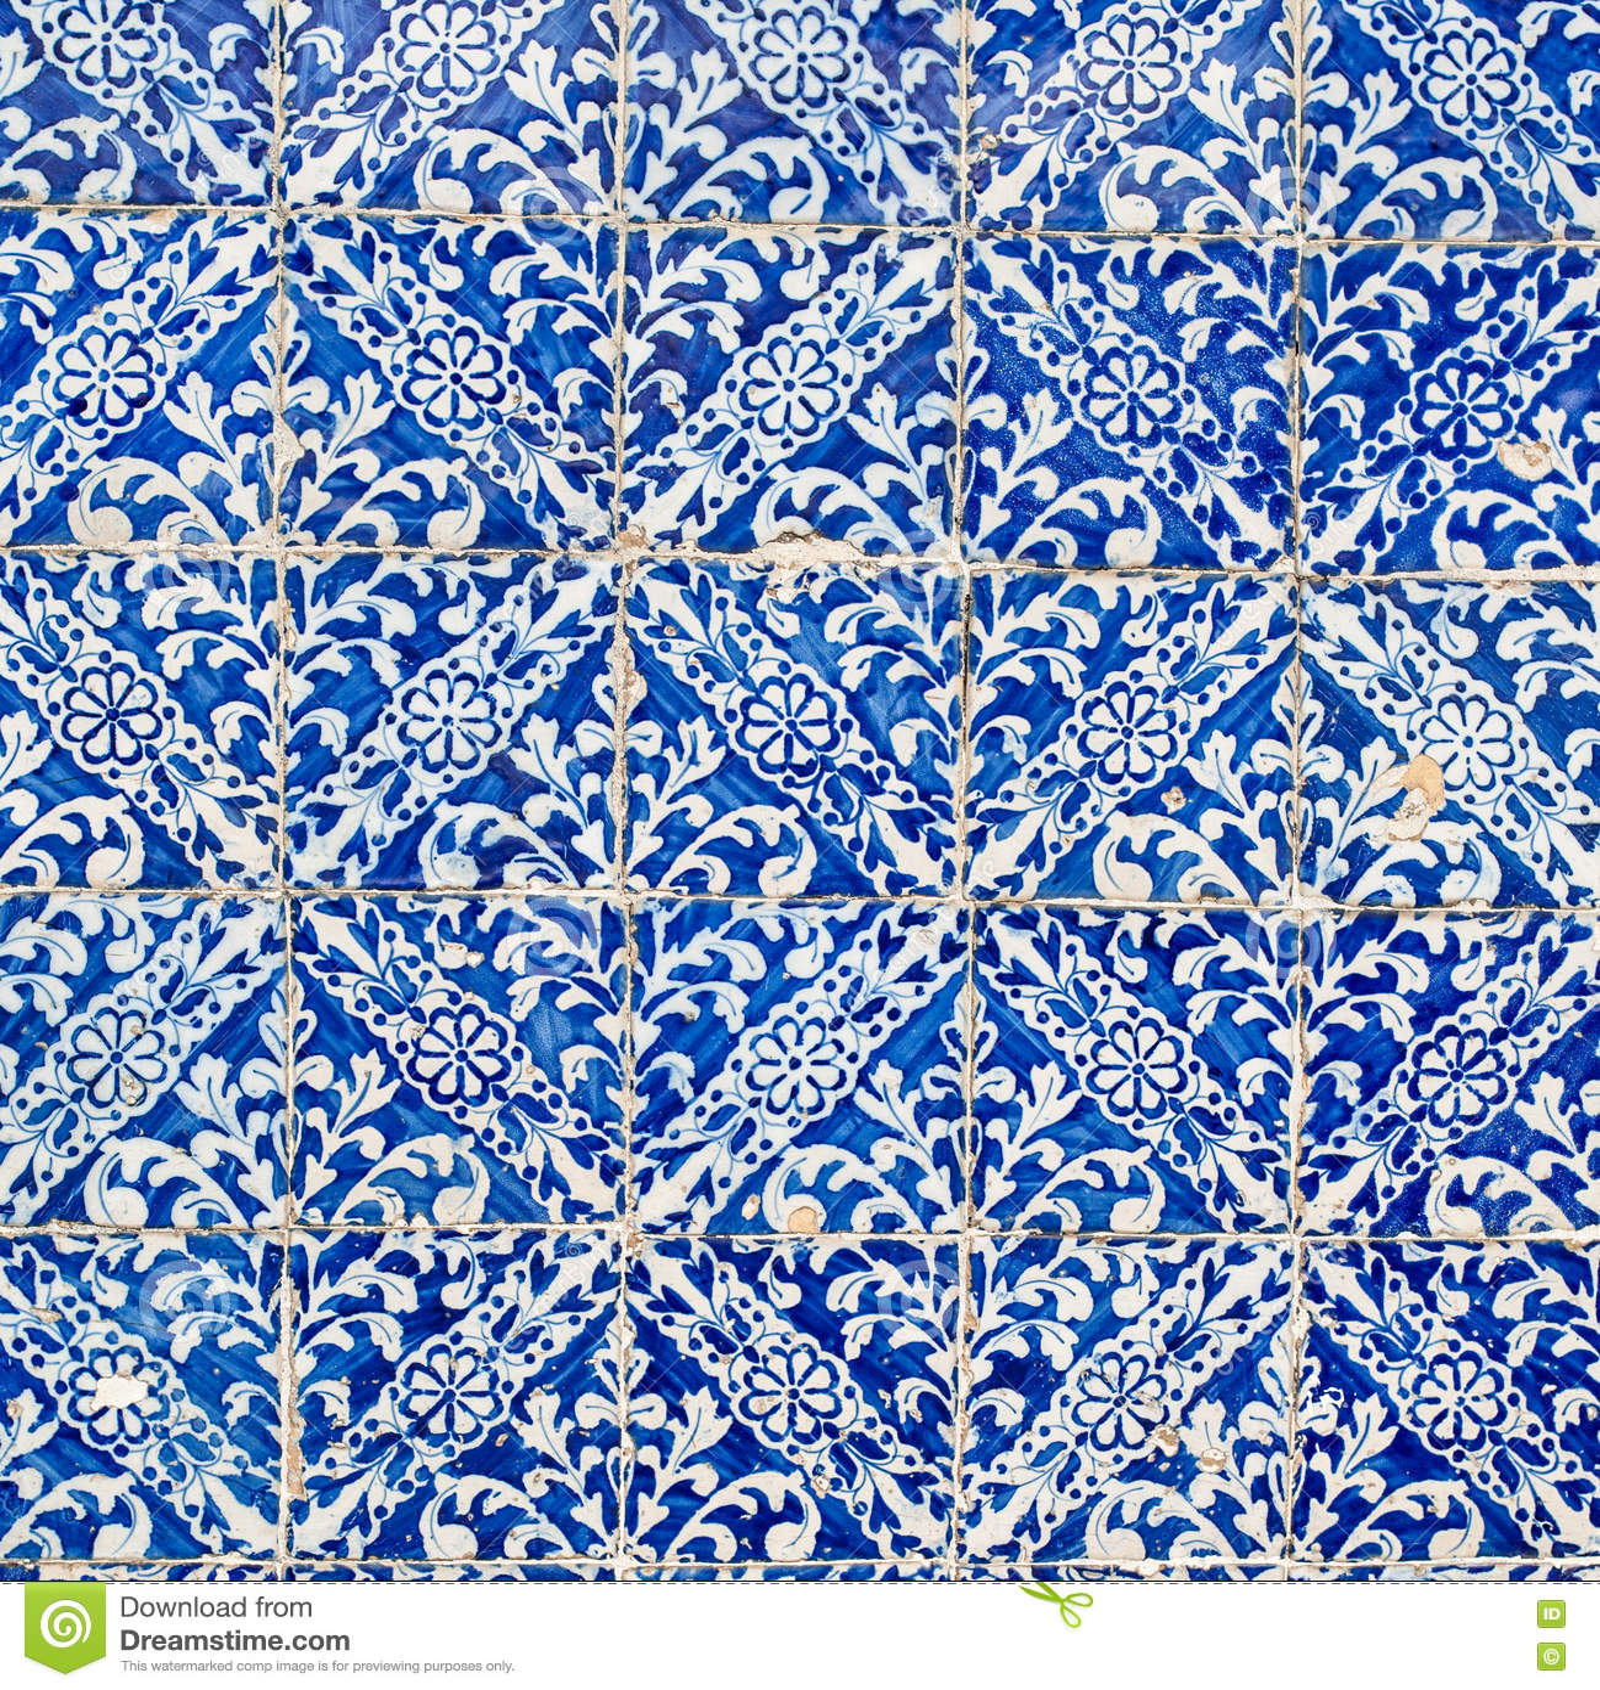 Indigo Blue Tiles Floor Ornament Collection. Colorful Moroccan ...